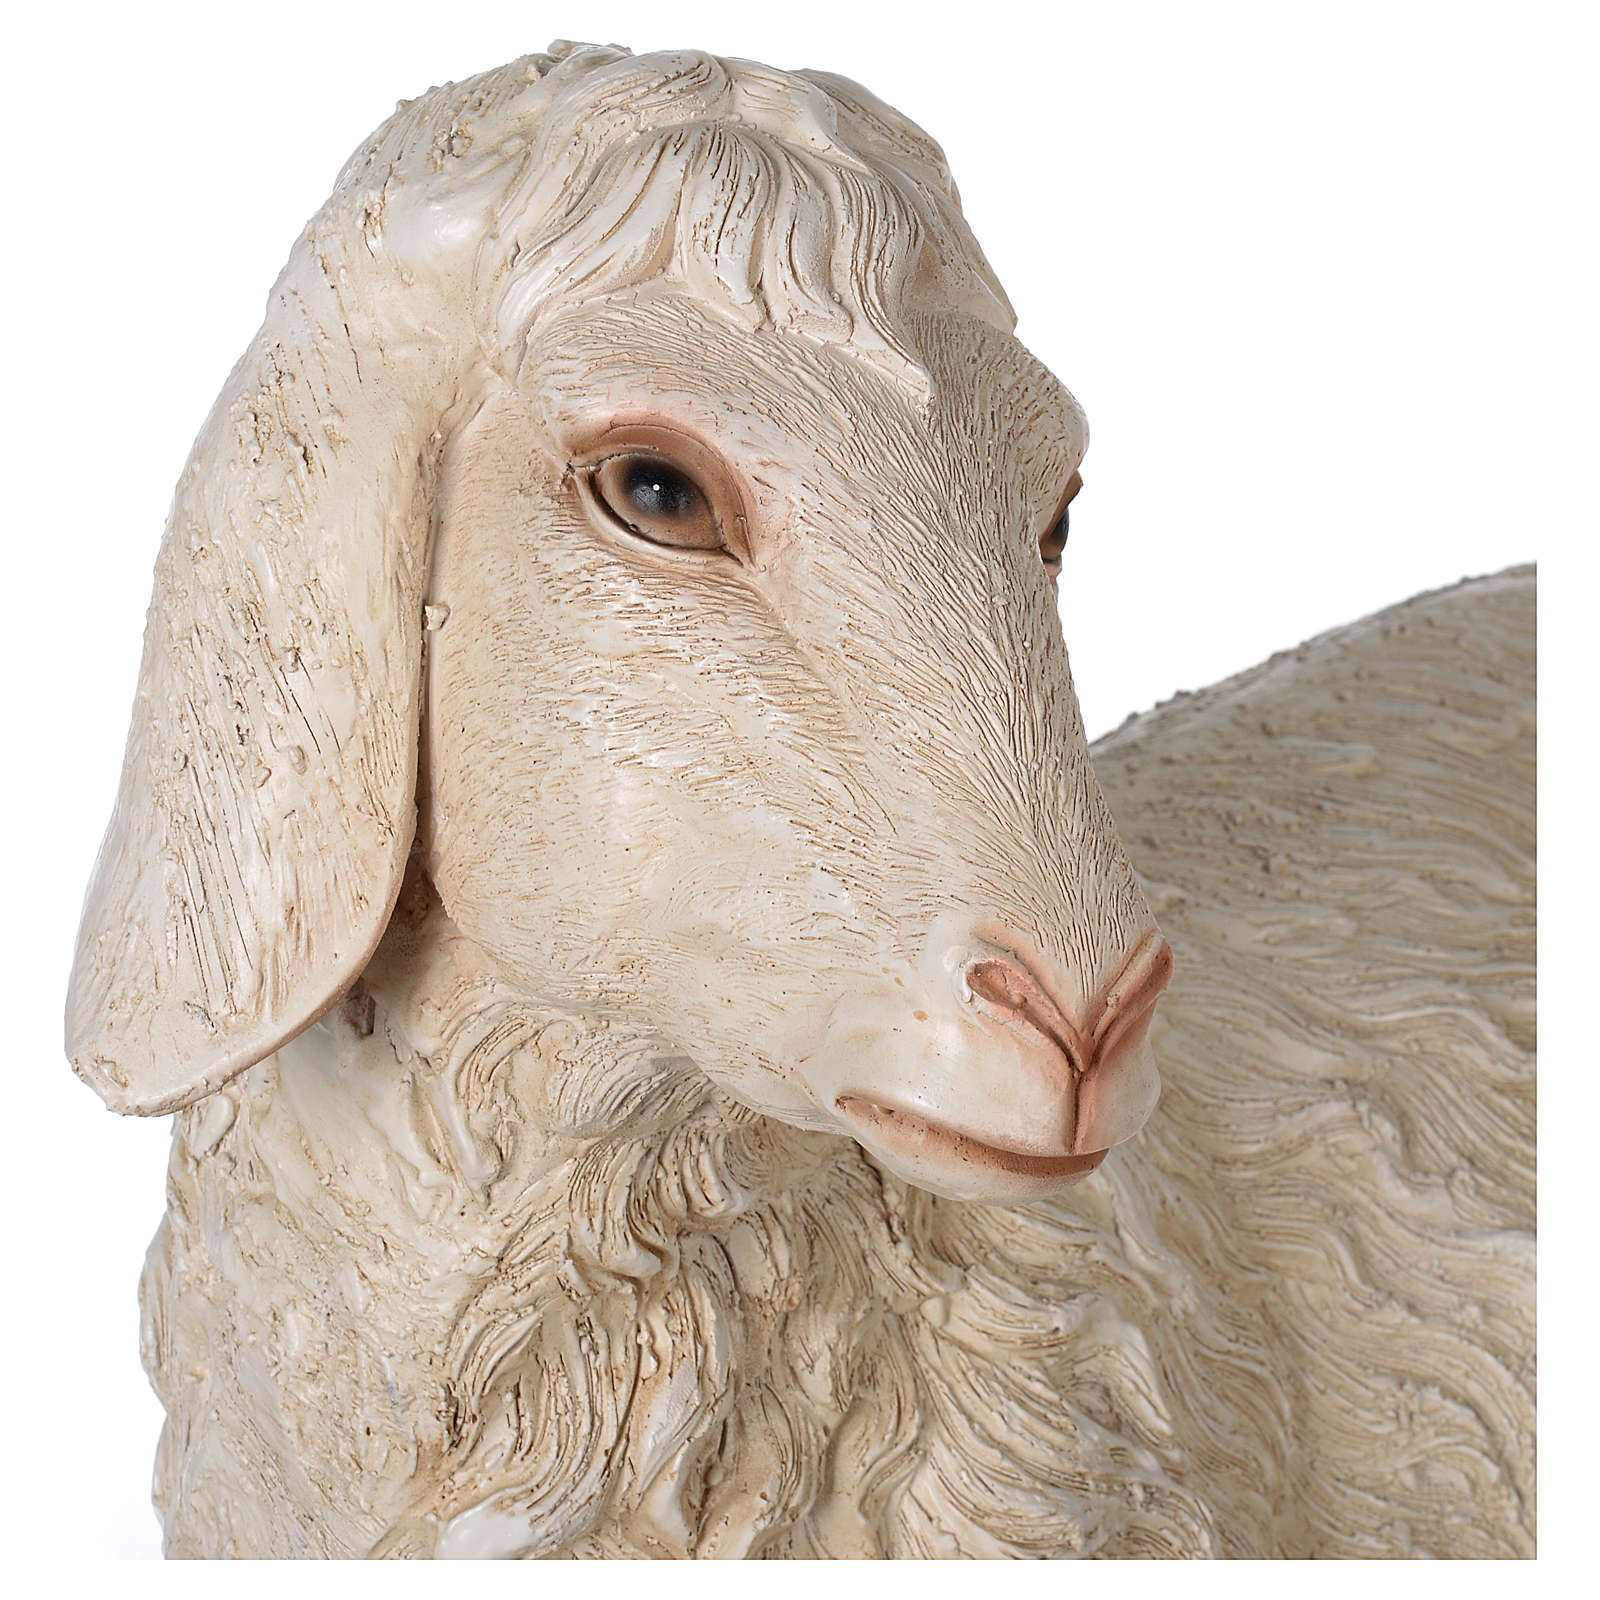 Pecorella resina presepe 140-160 cm 3